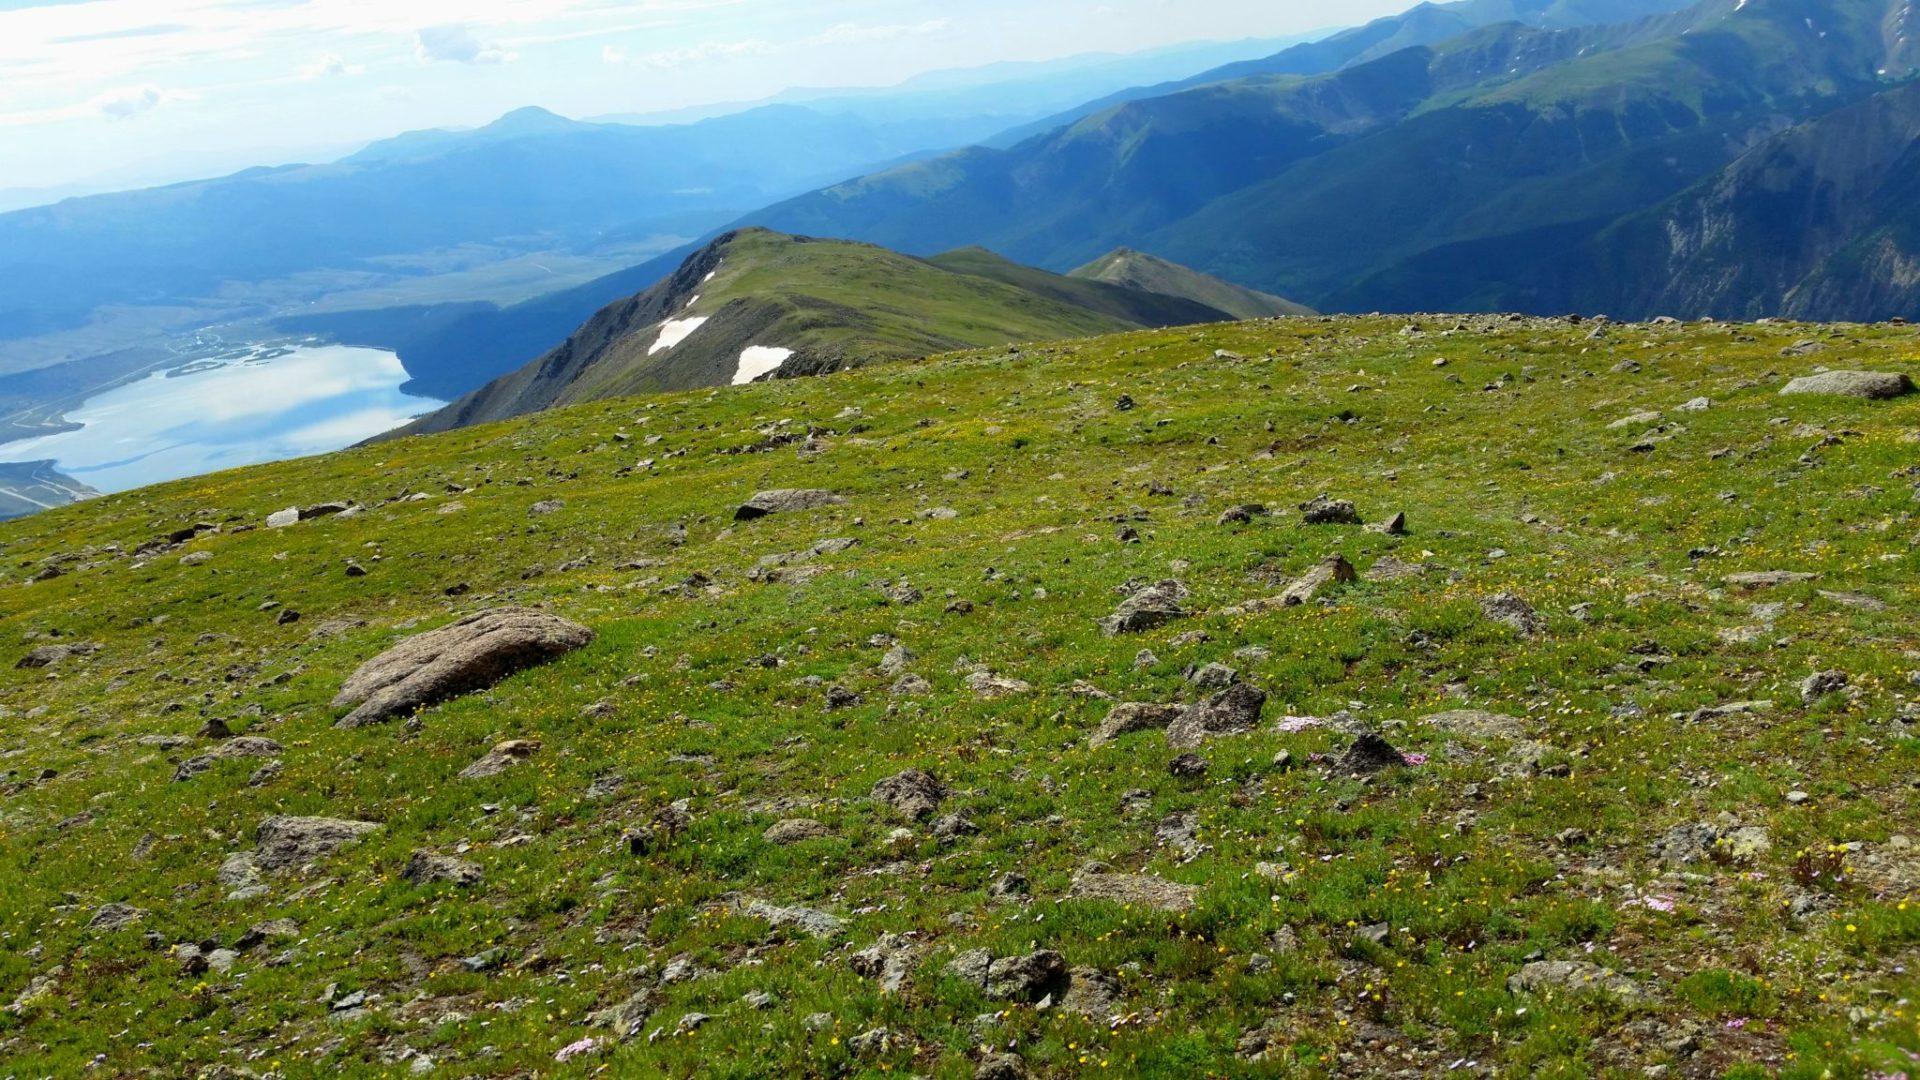 Mt Elbert ridge with Twin Lakes on the left